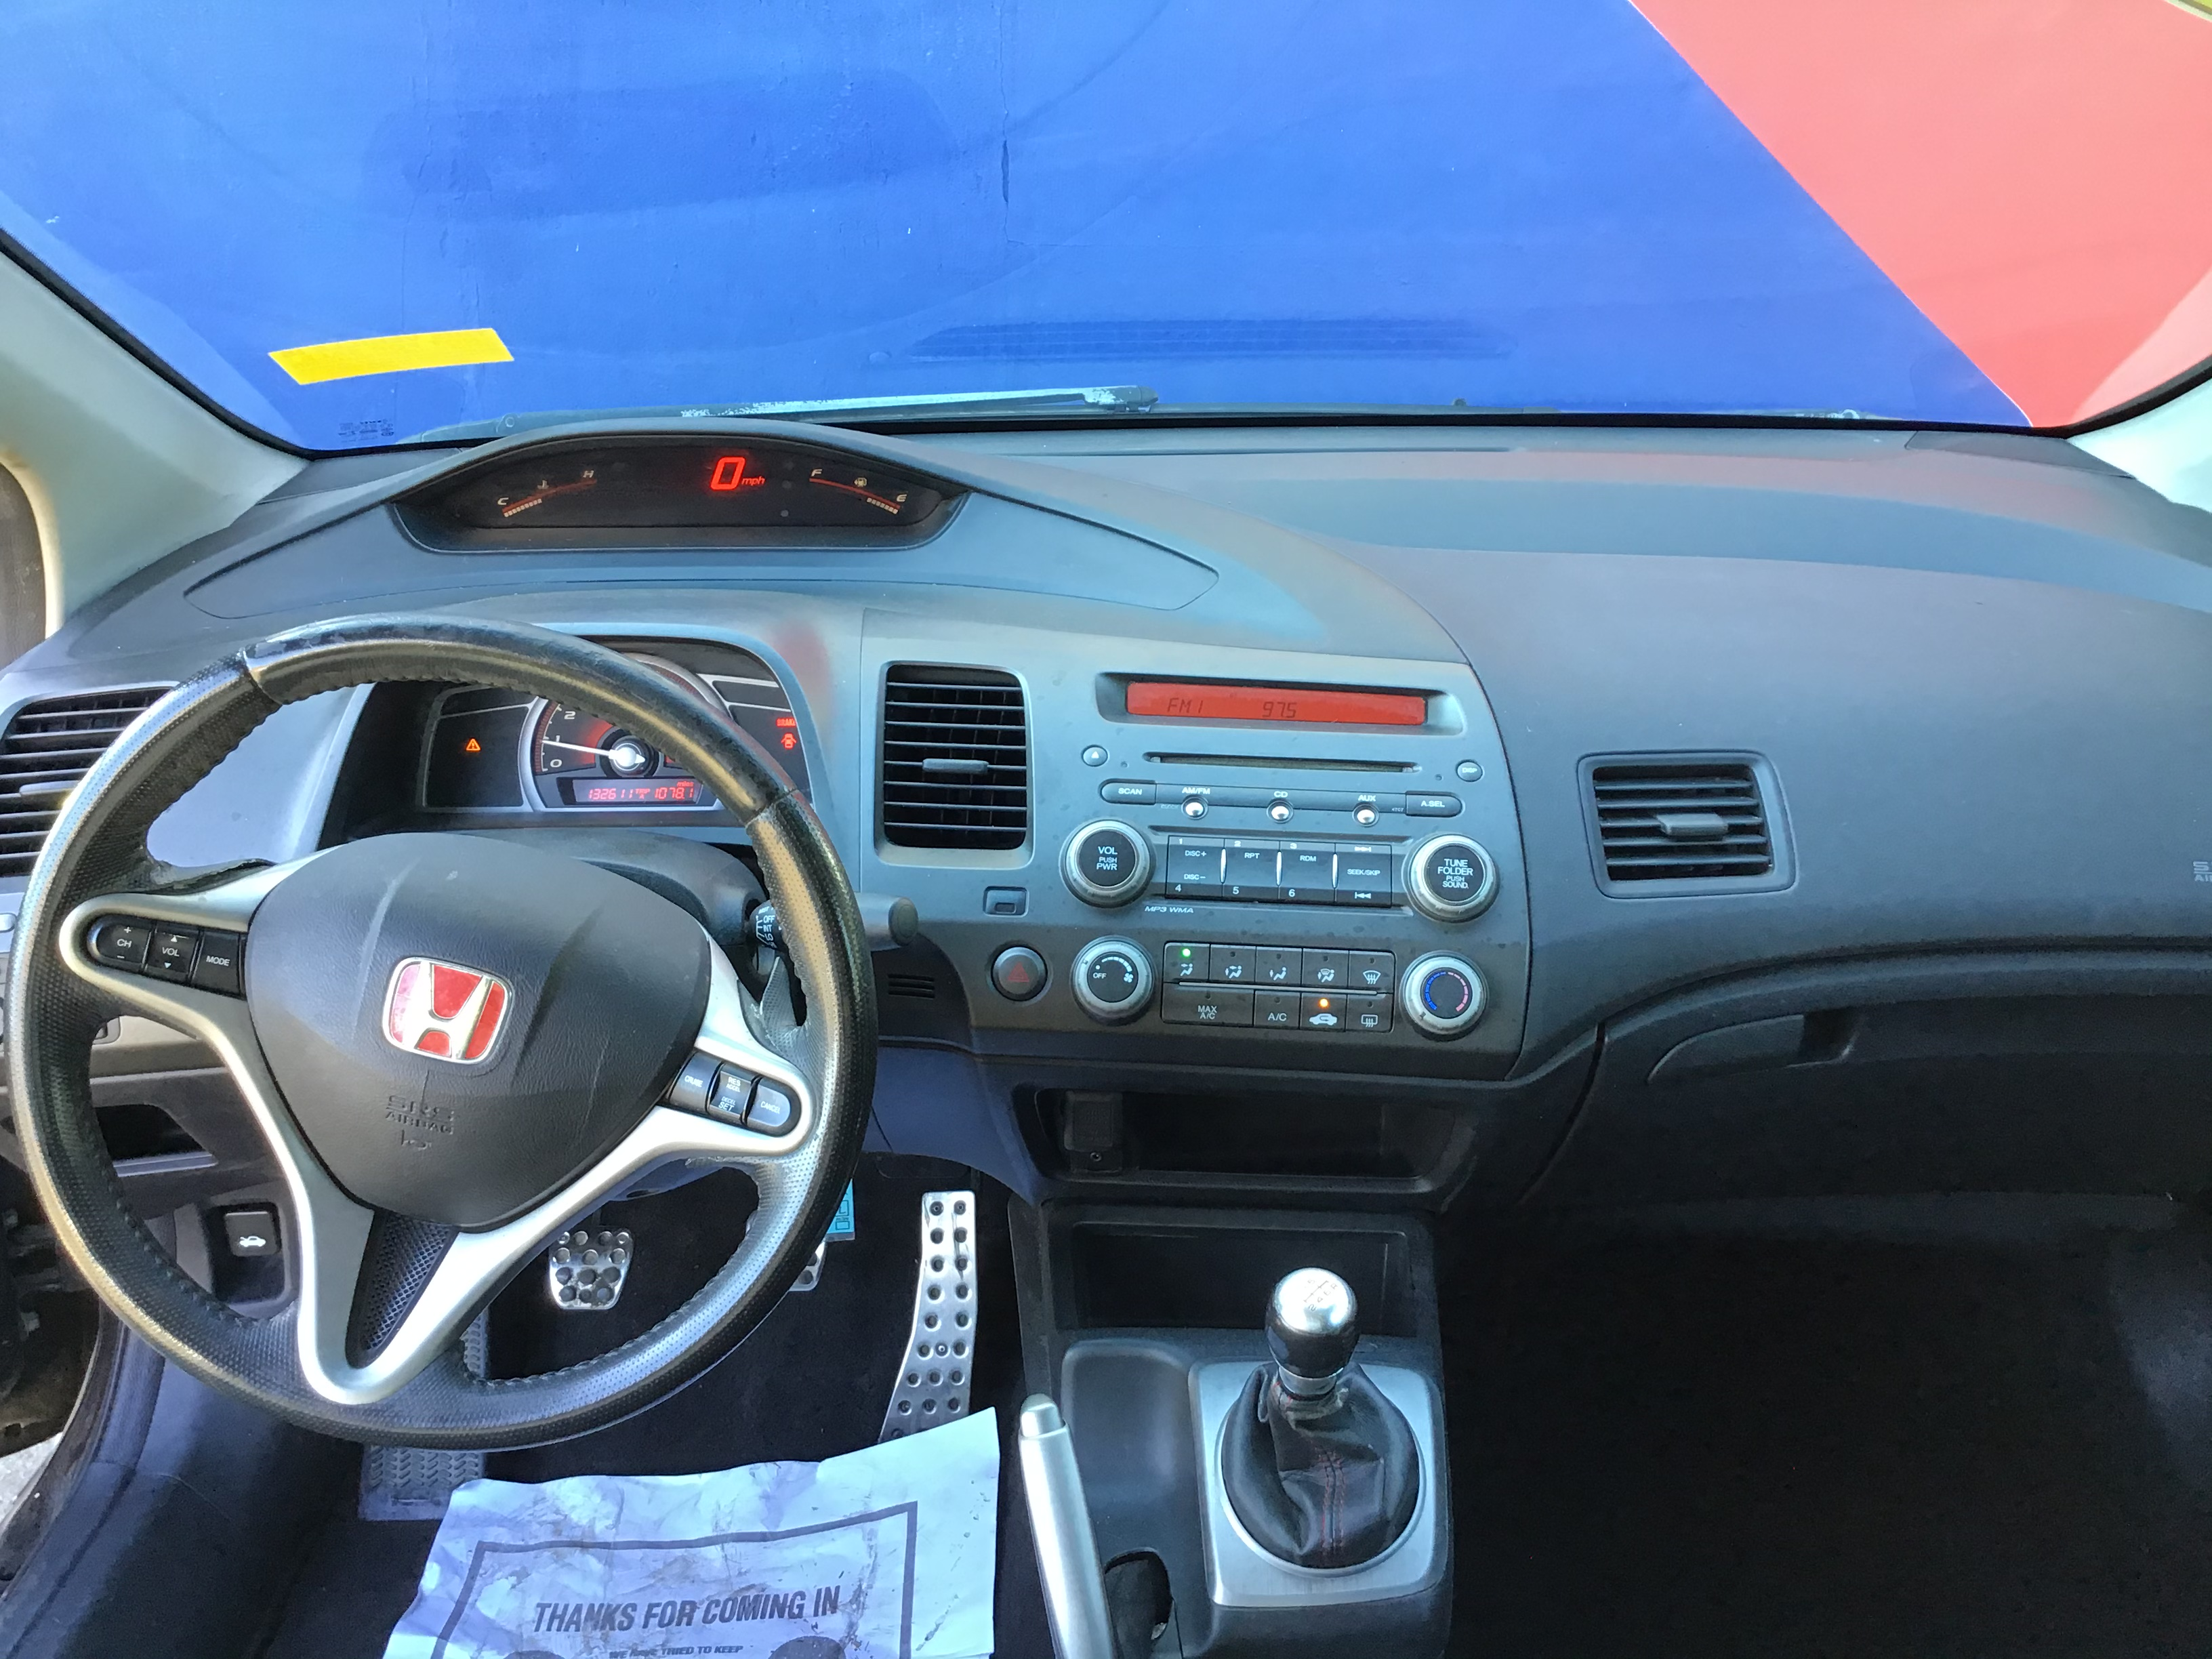 used vehicle - Coupe HONDA CIVIC CPE 2008